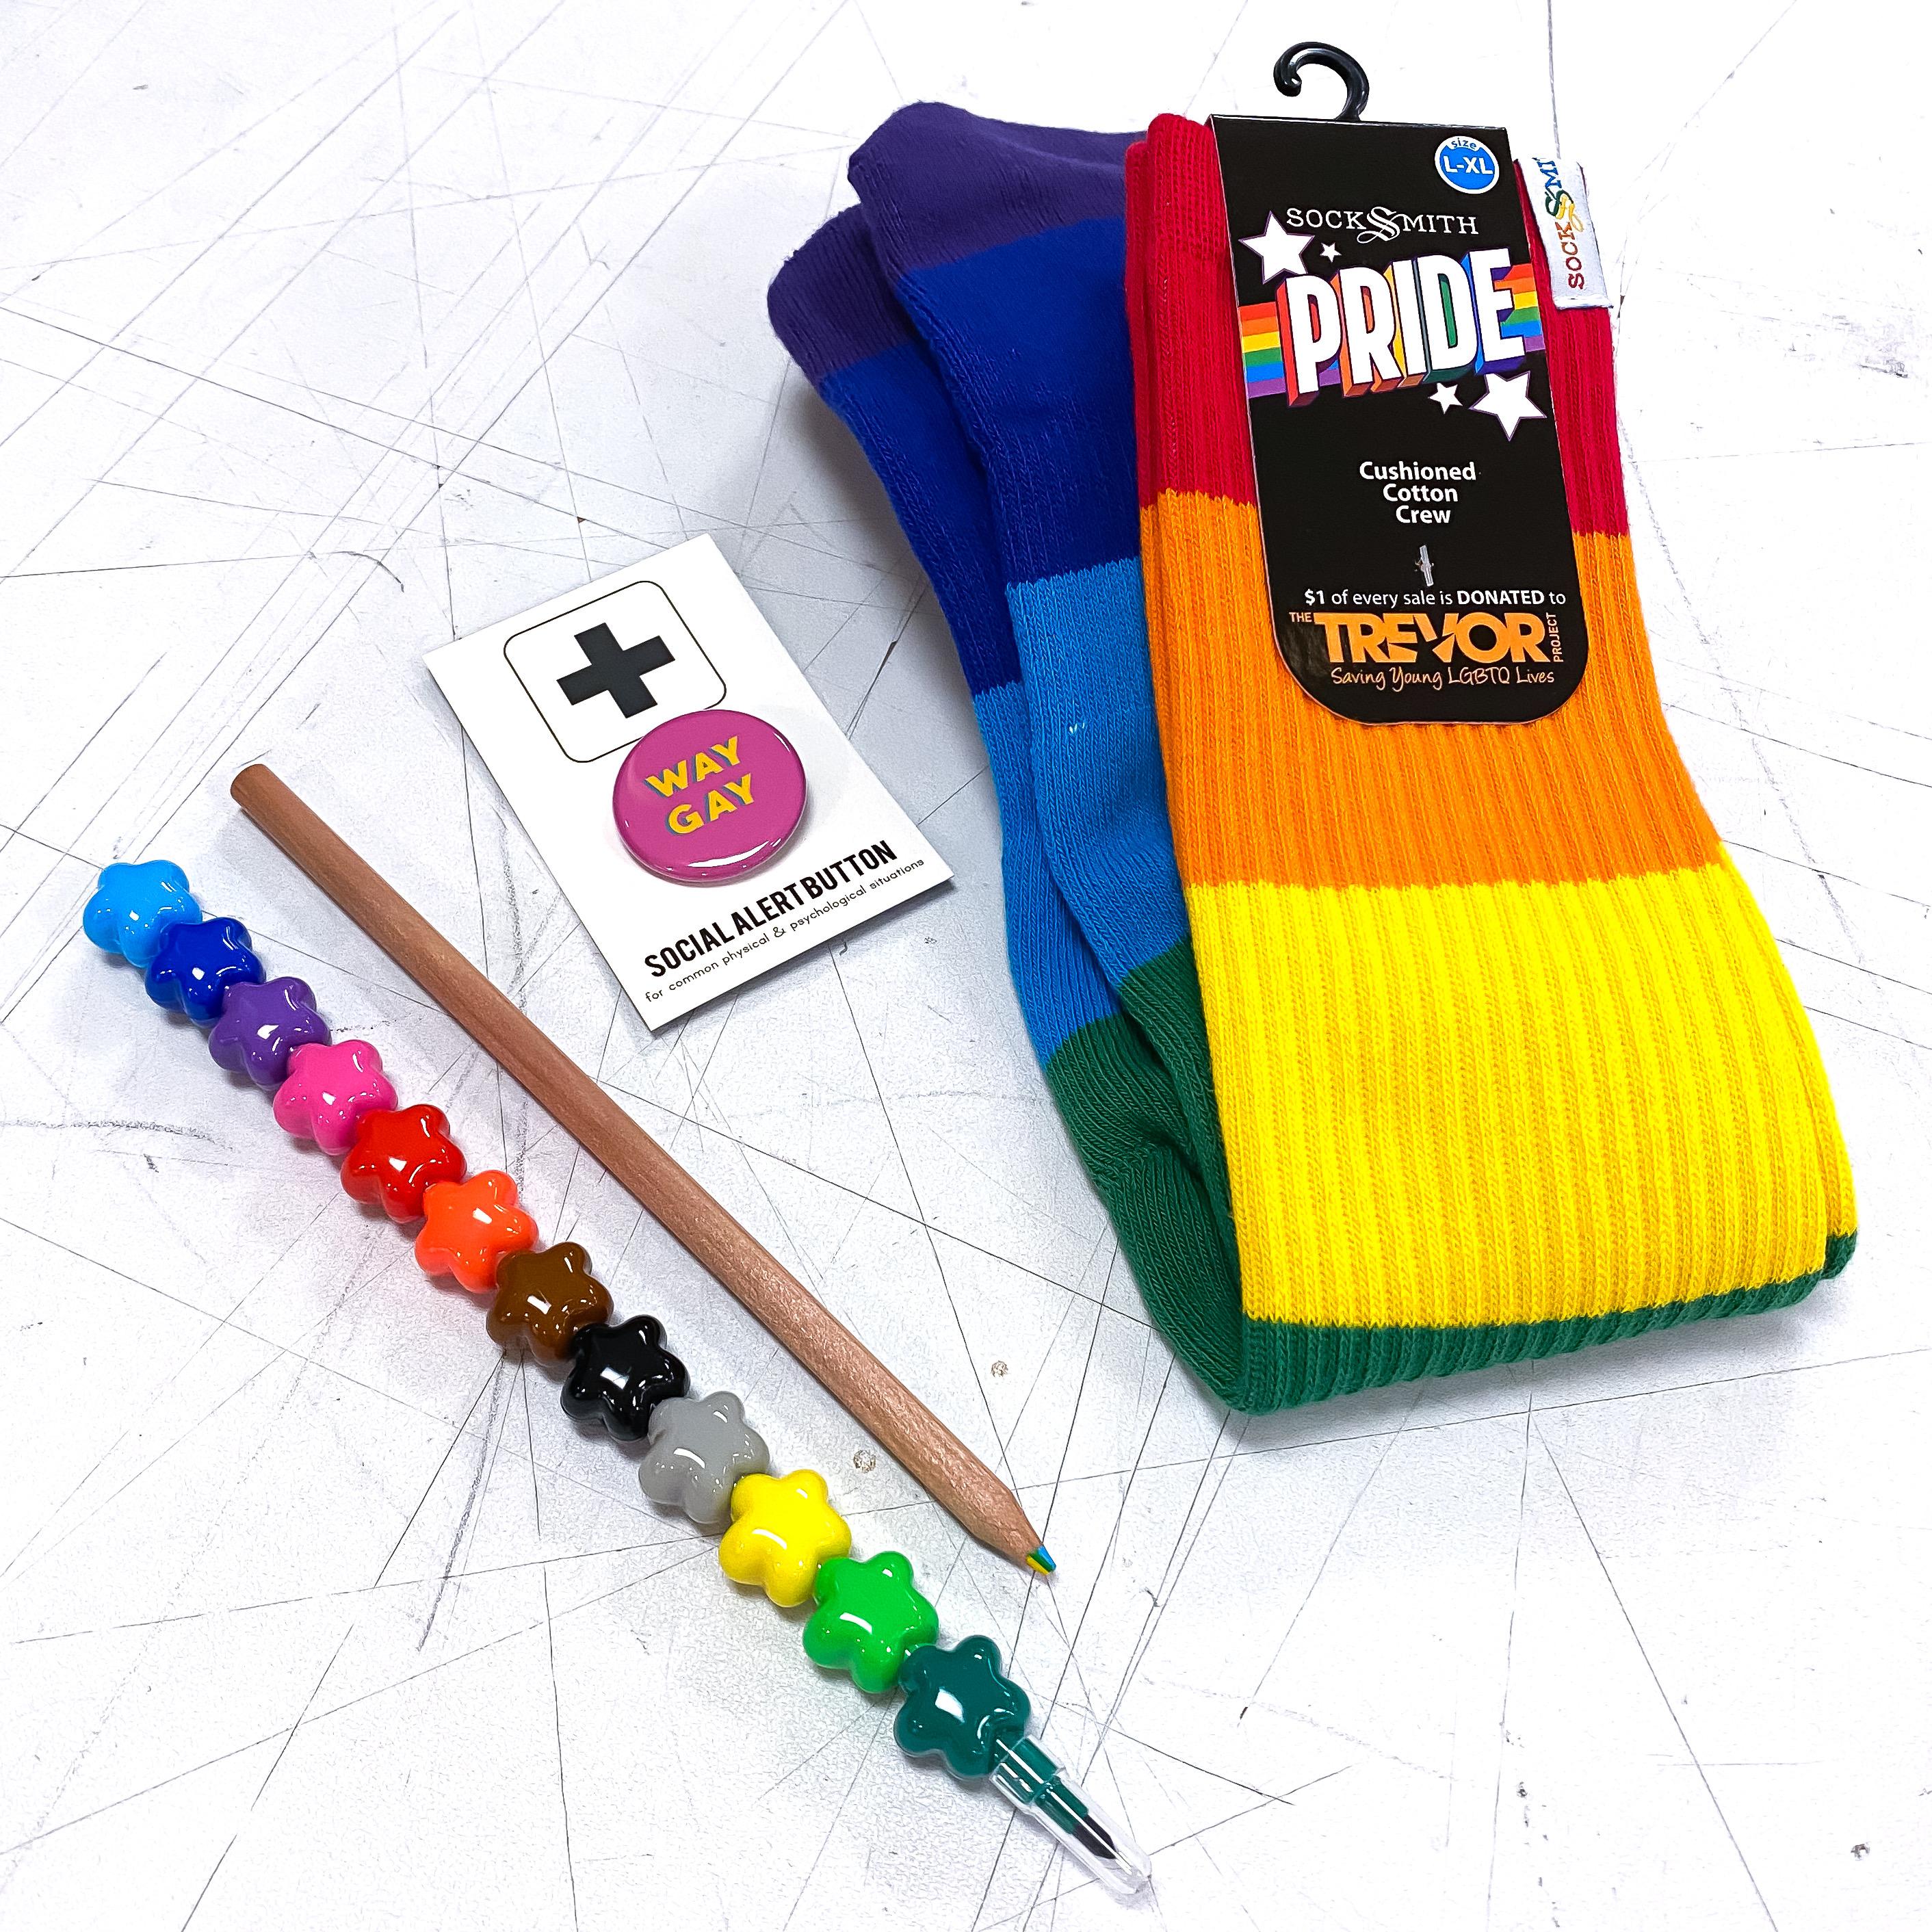 Way Gay Rainbow Pride Kit!